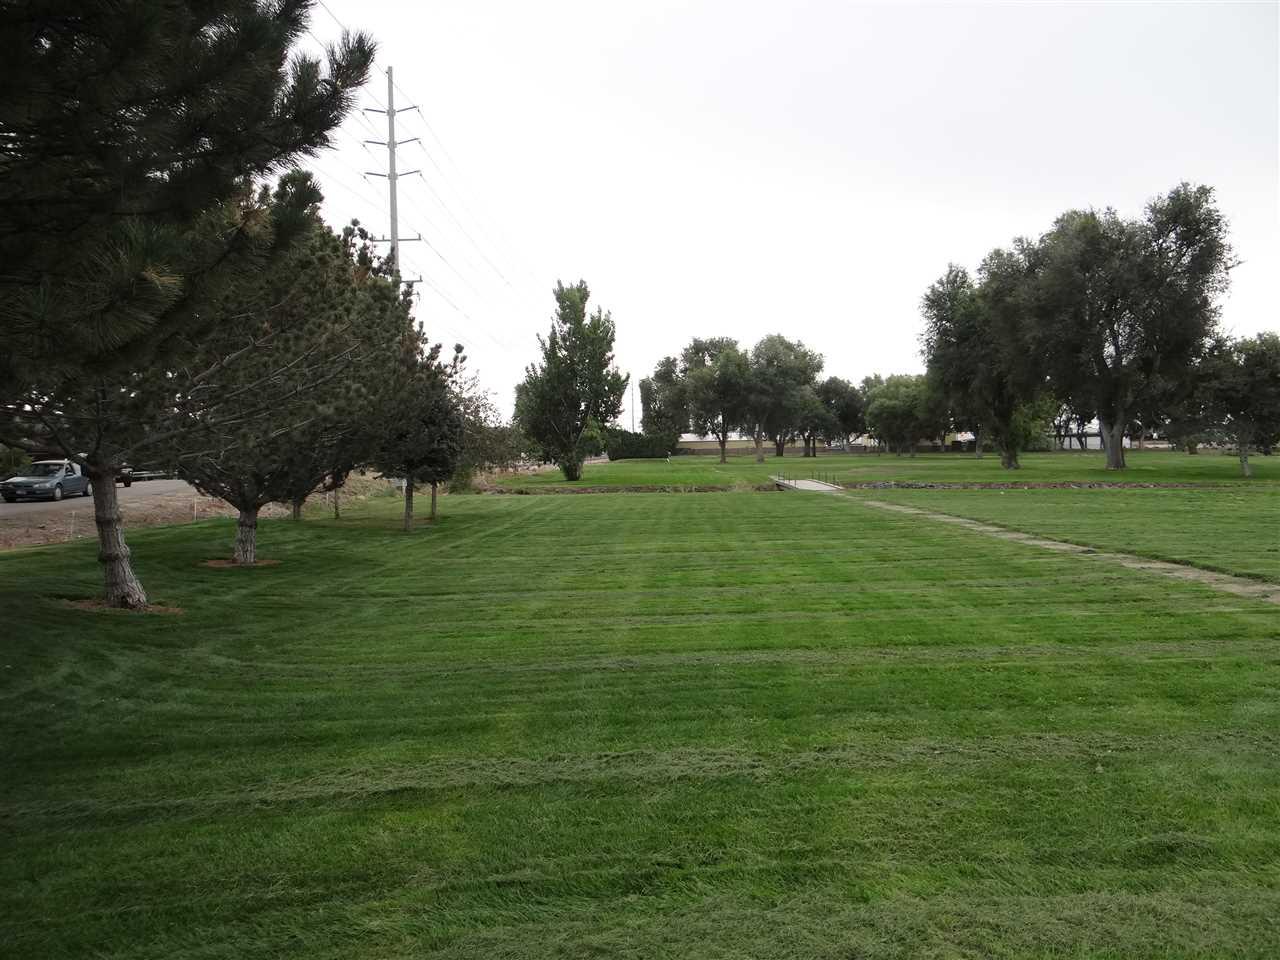 Land for Sale at 525 N Broadmore Way Nampa, Idaho 83687